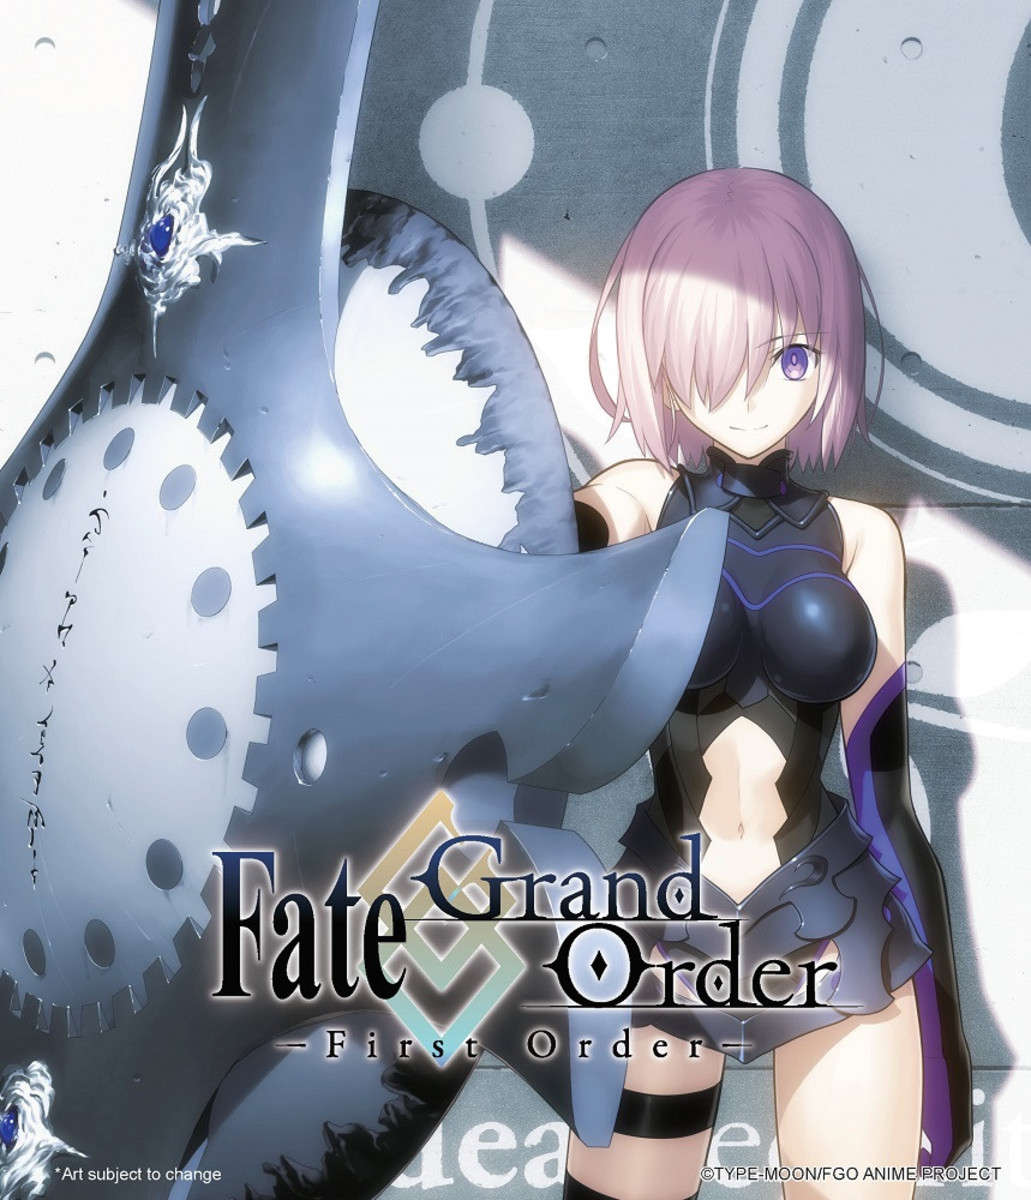 Fate/Grand Order: First Order U.S. blu-ray cover.